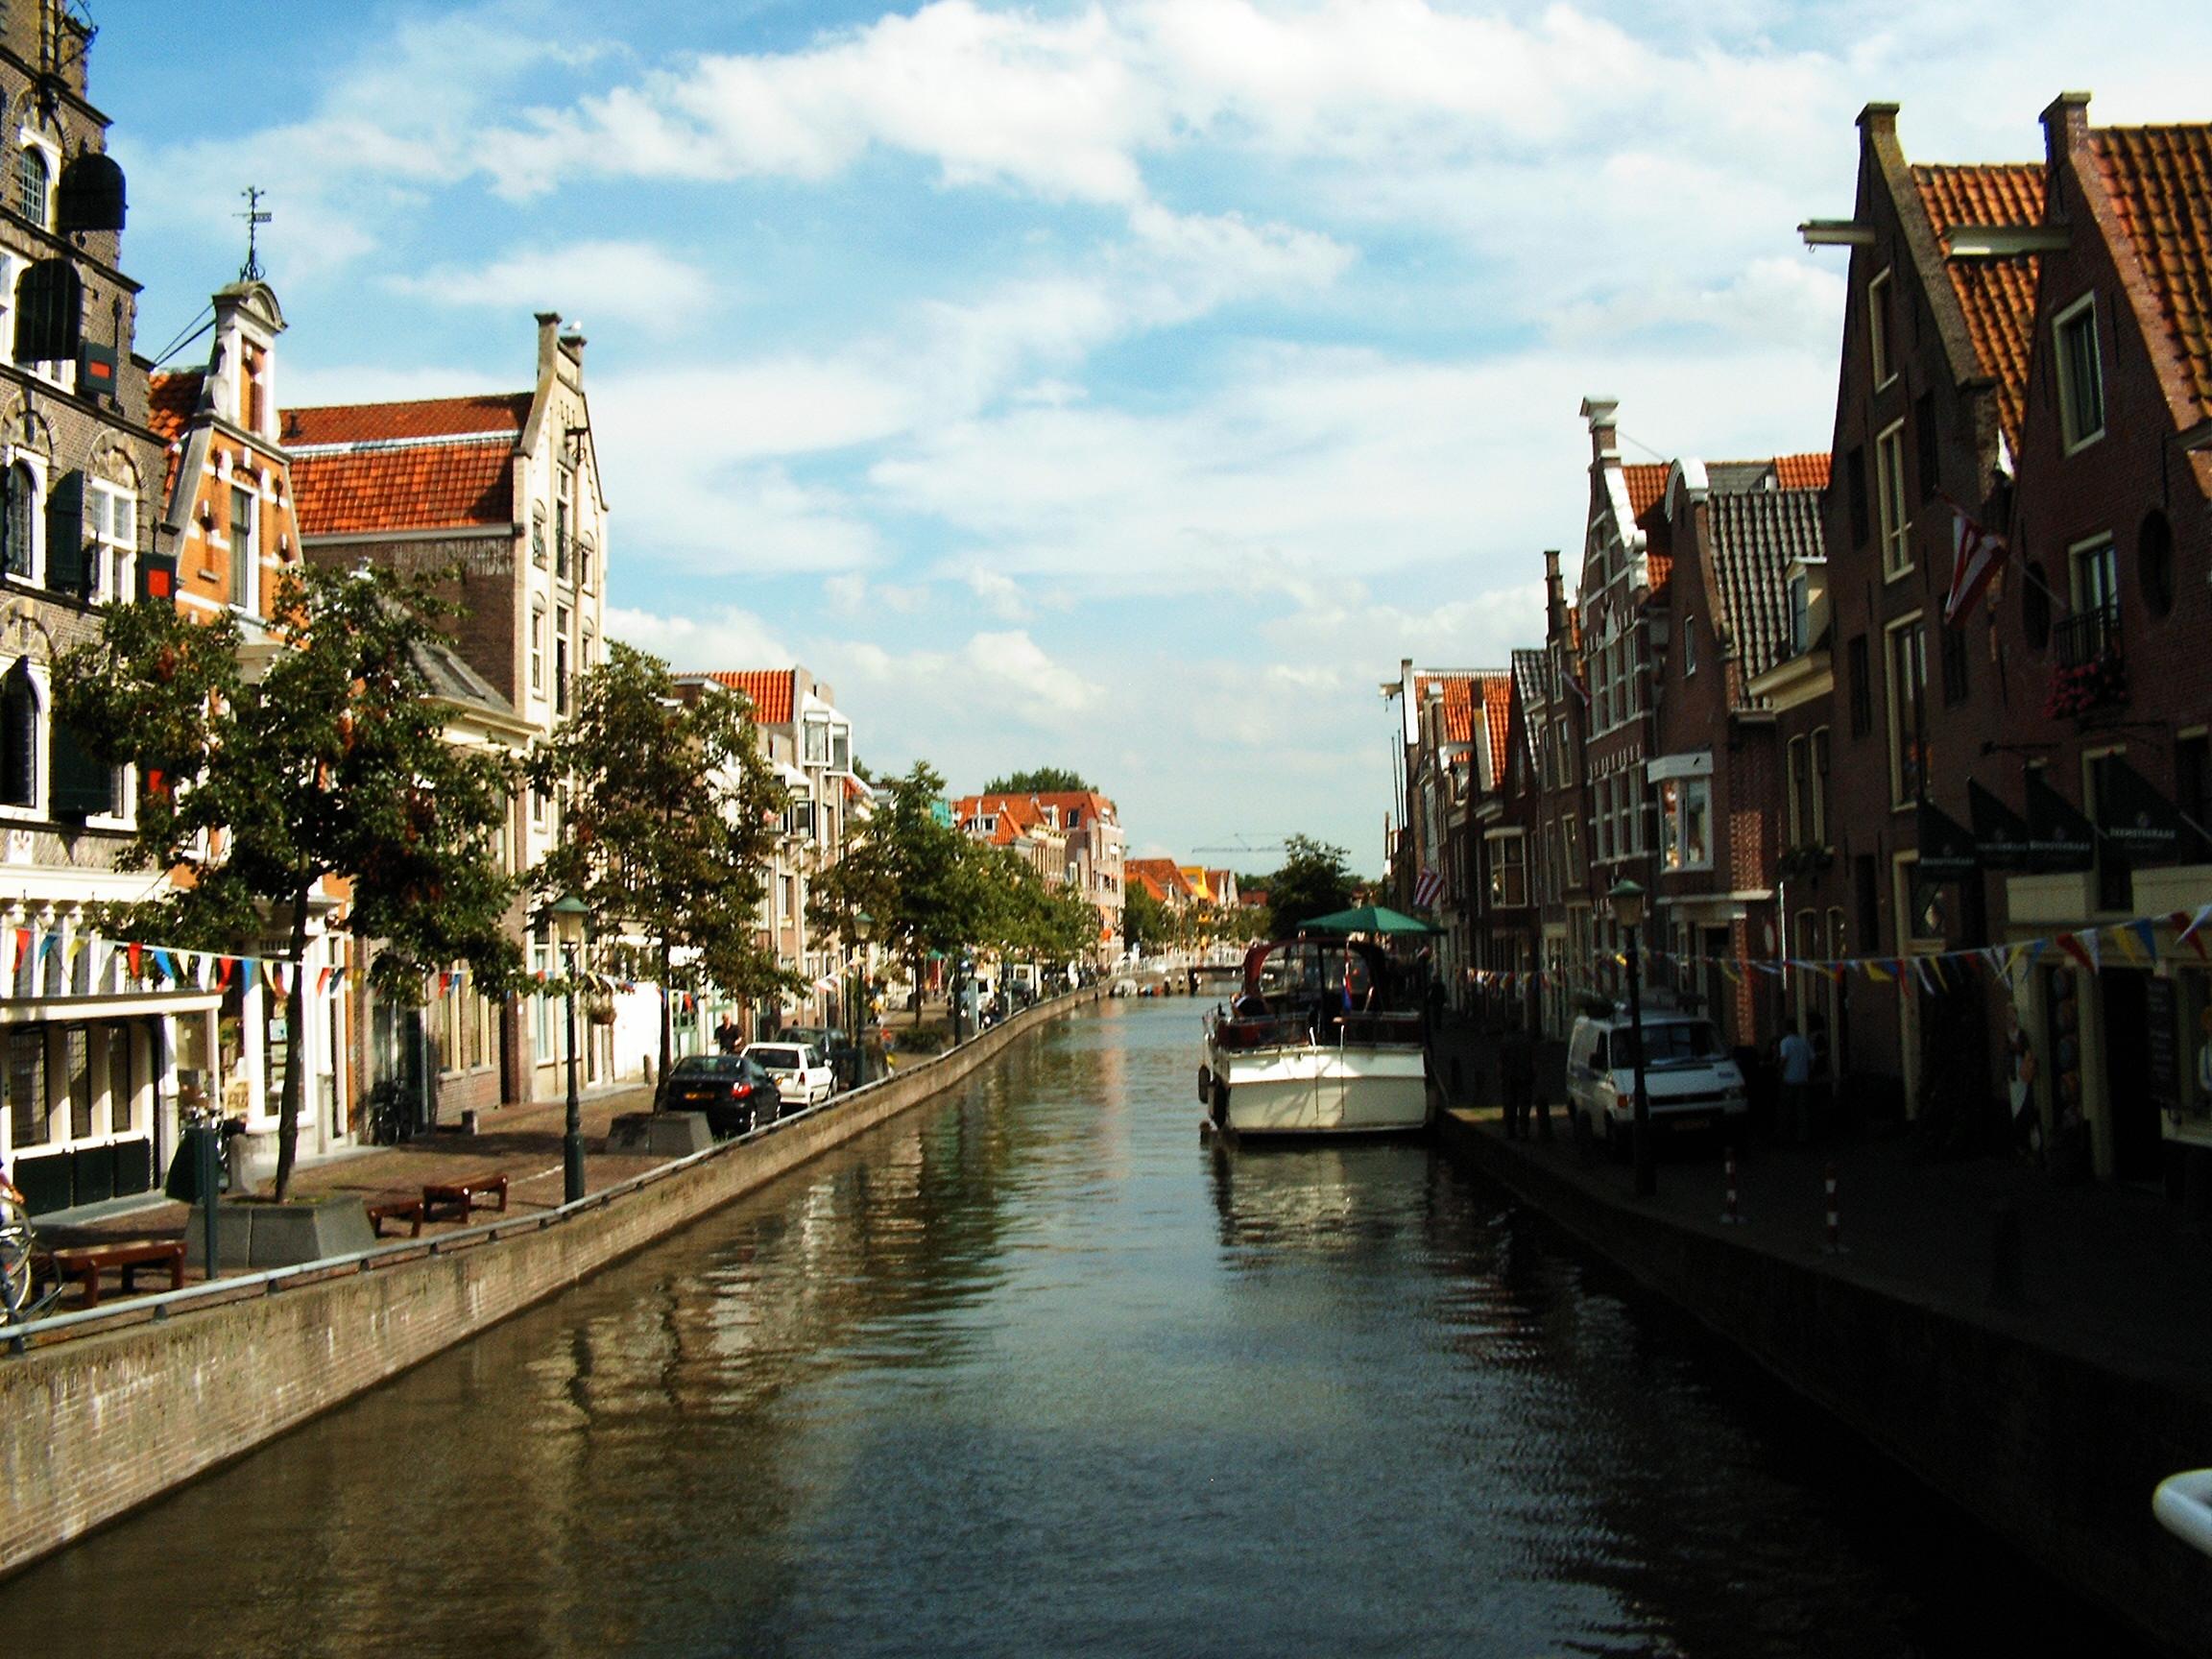 Resultado de imagem para Alkmaar